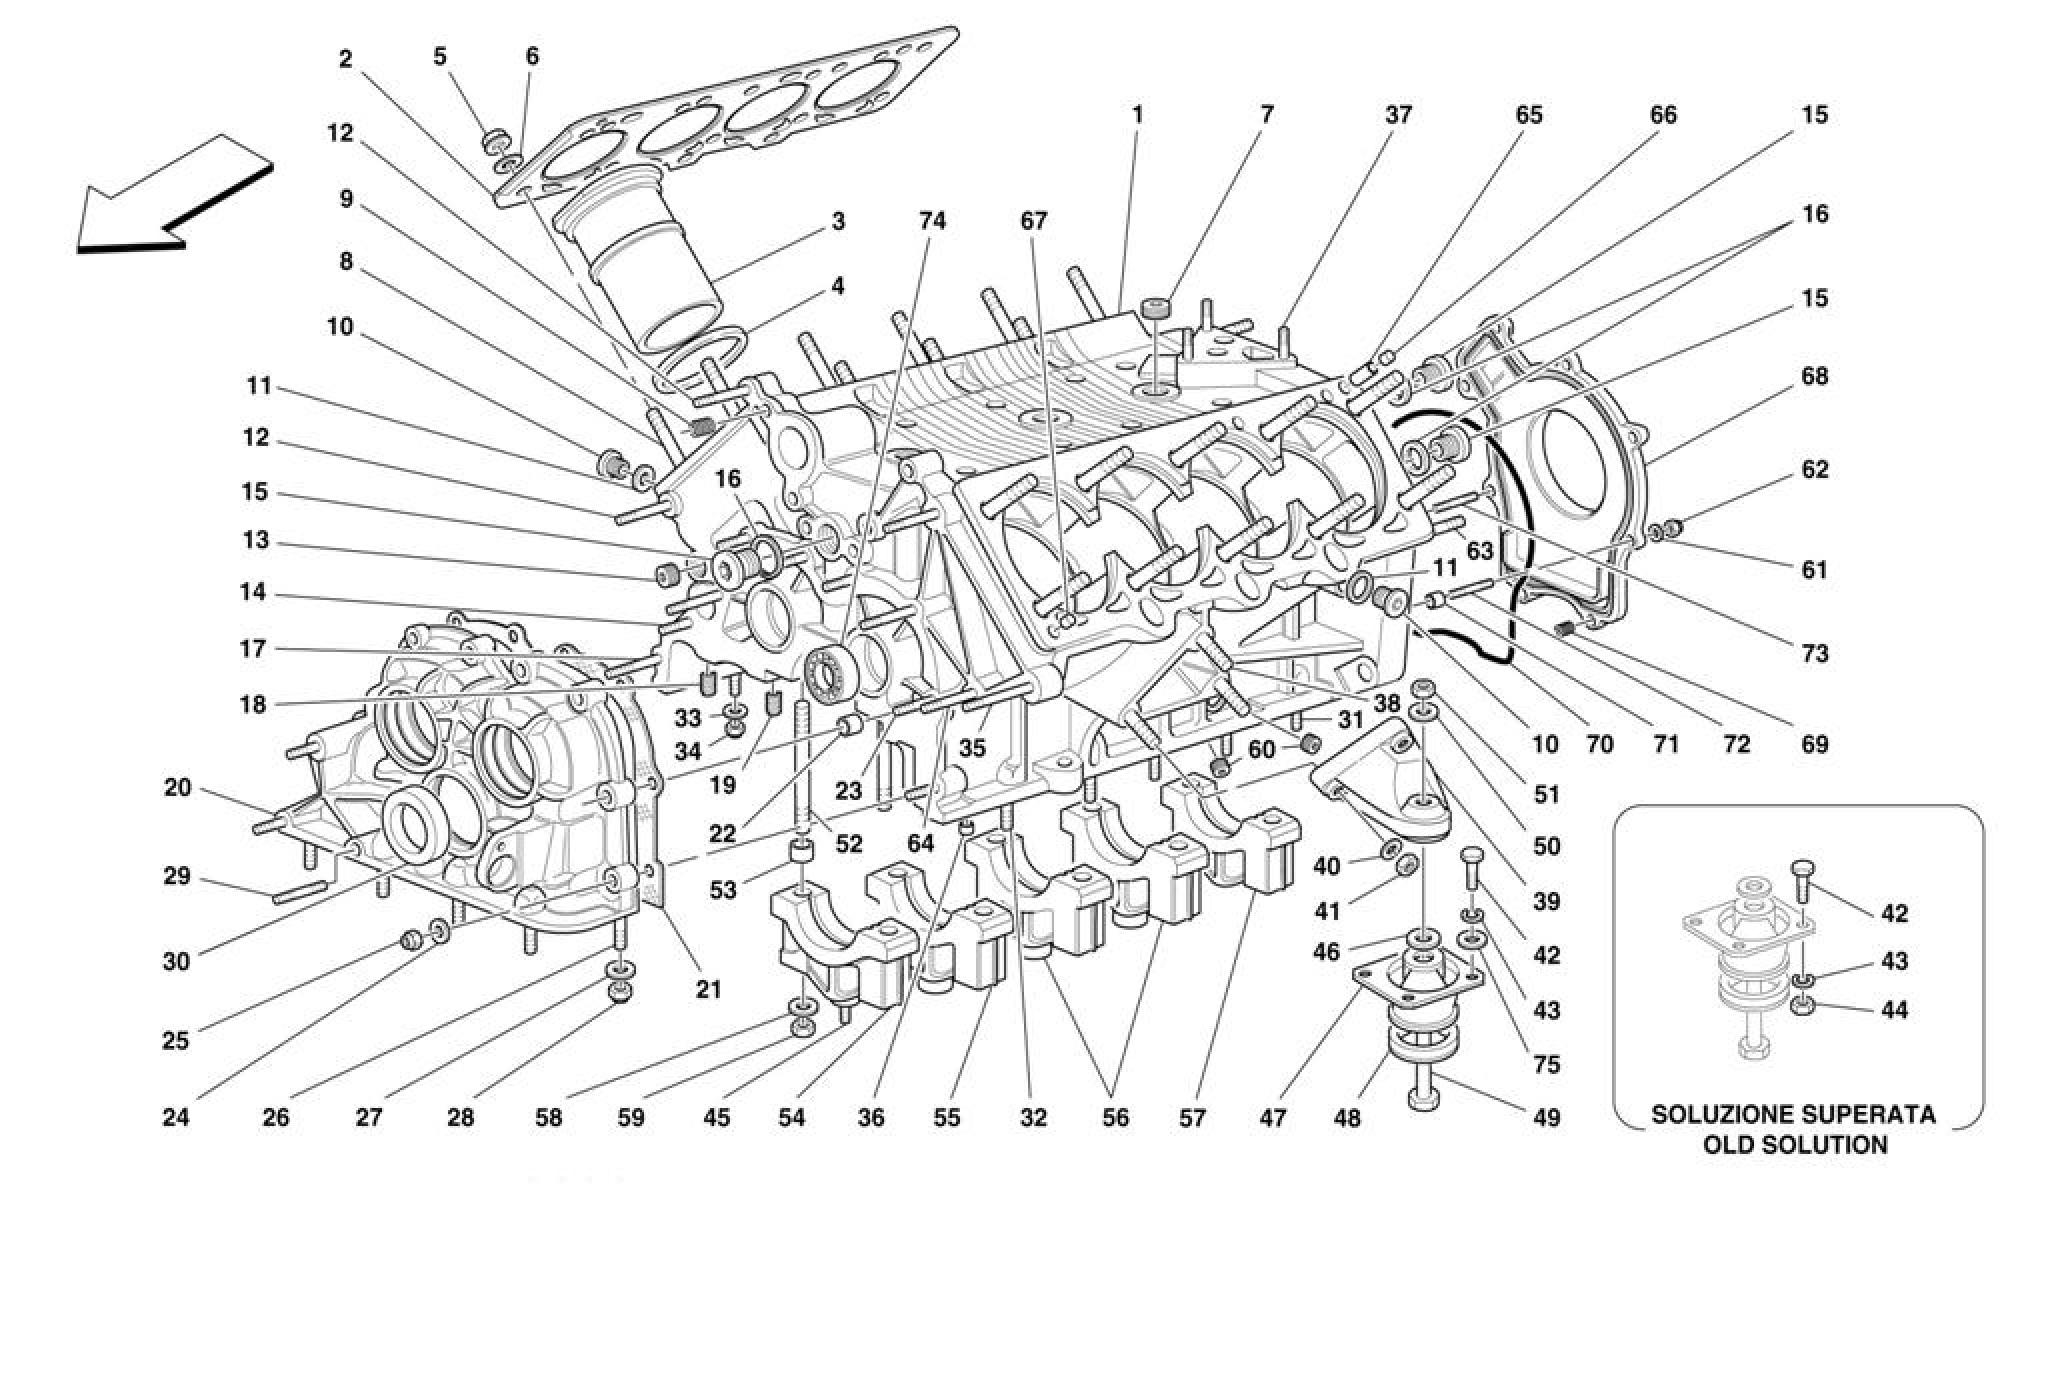 Ferrari F355 M2 7 Crankcase